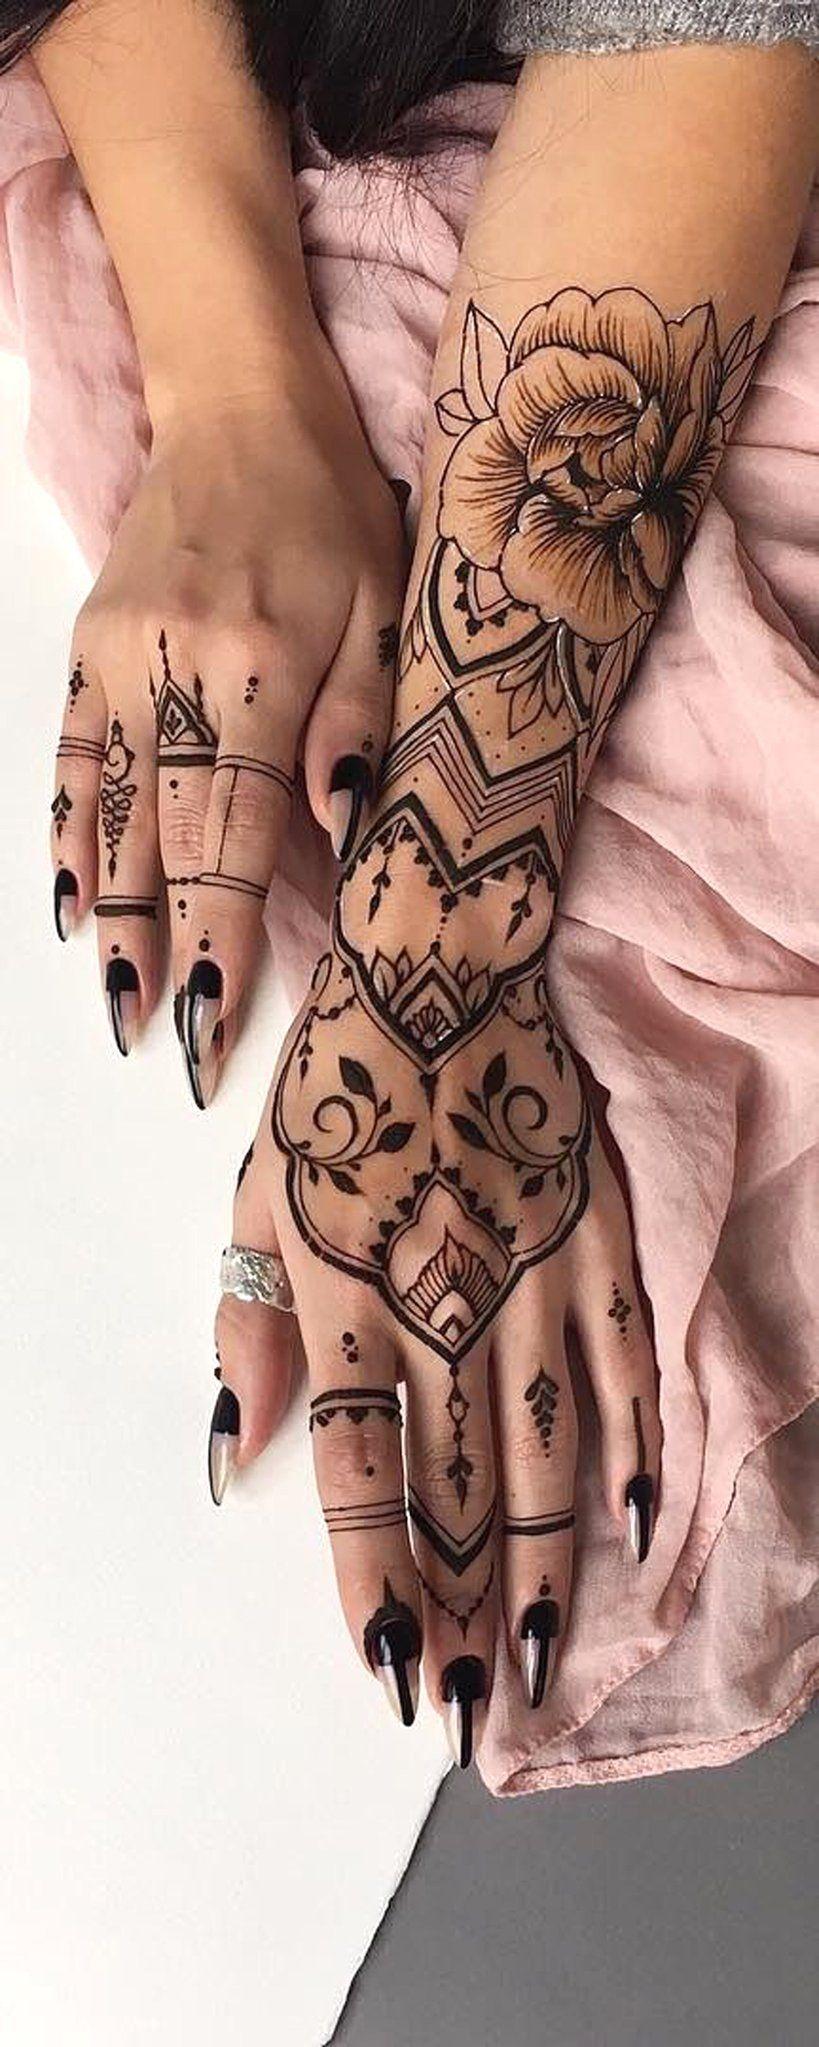 Black Henna Tattoo Designs: Black Henna Tribal Bohemian Hand Tattoo Ideas For Women